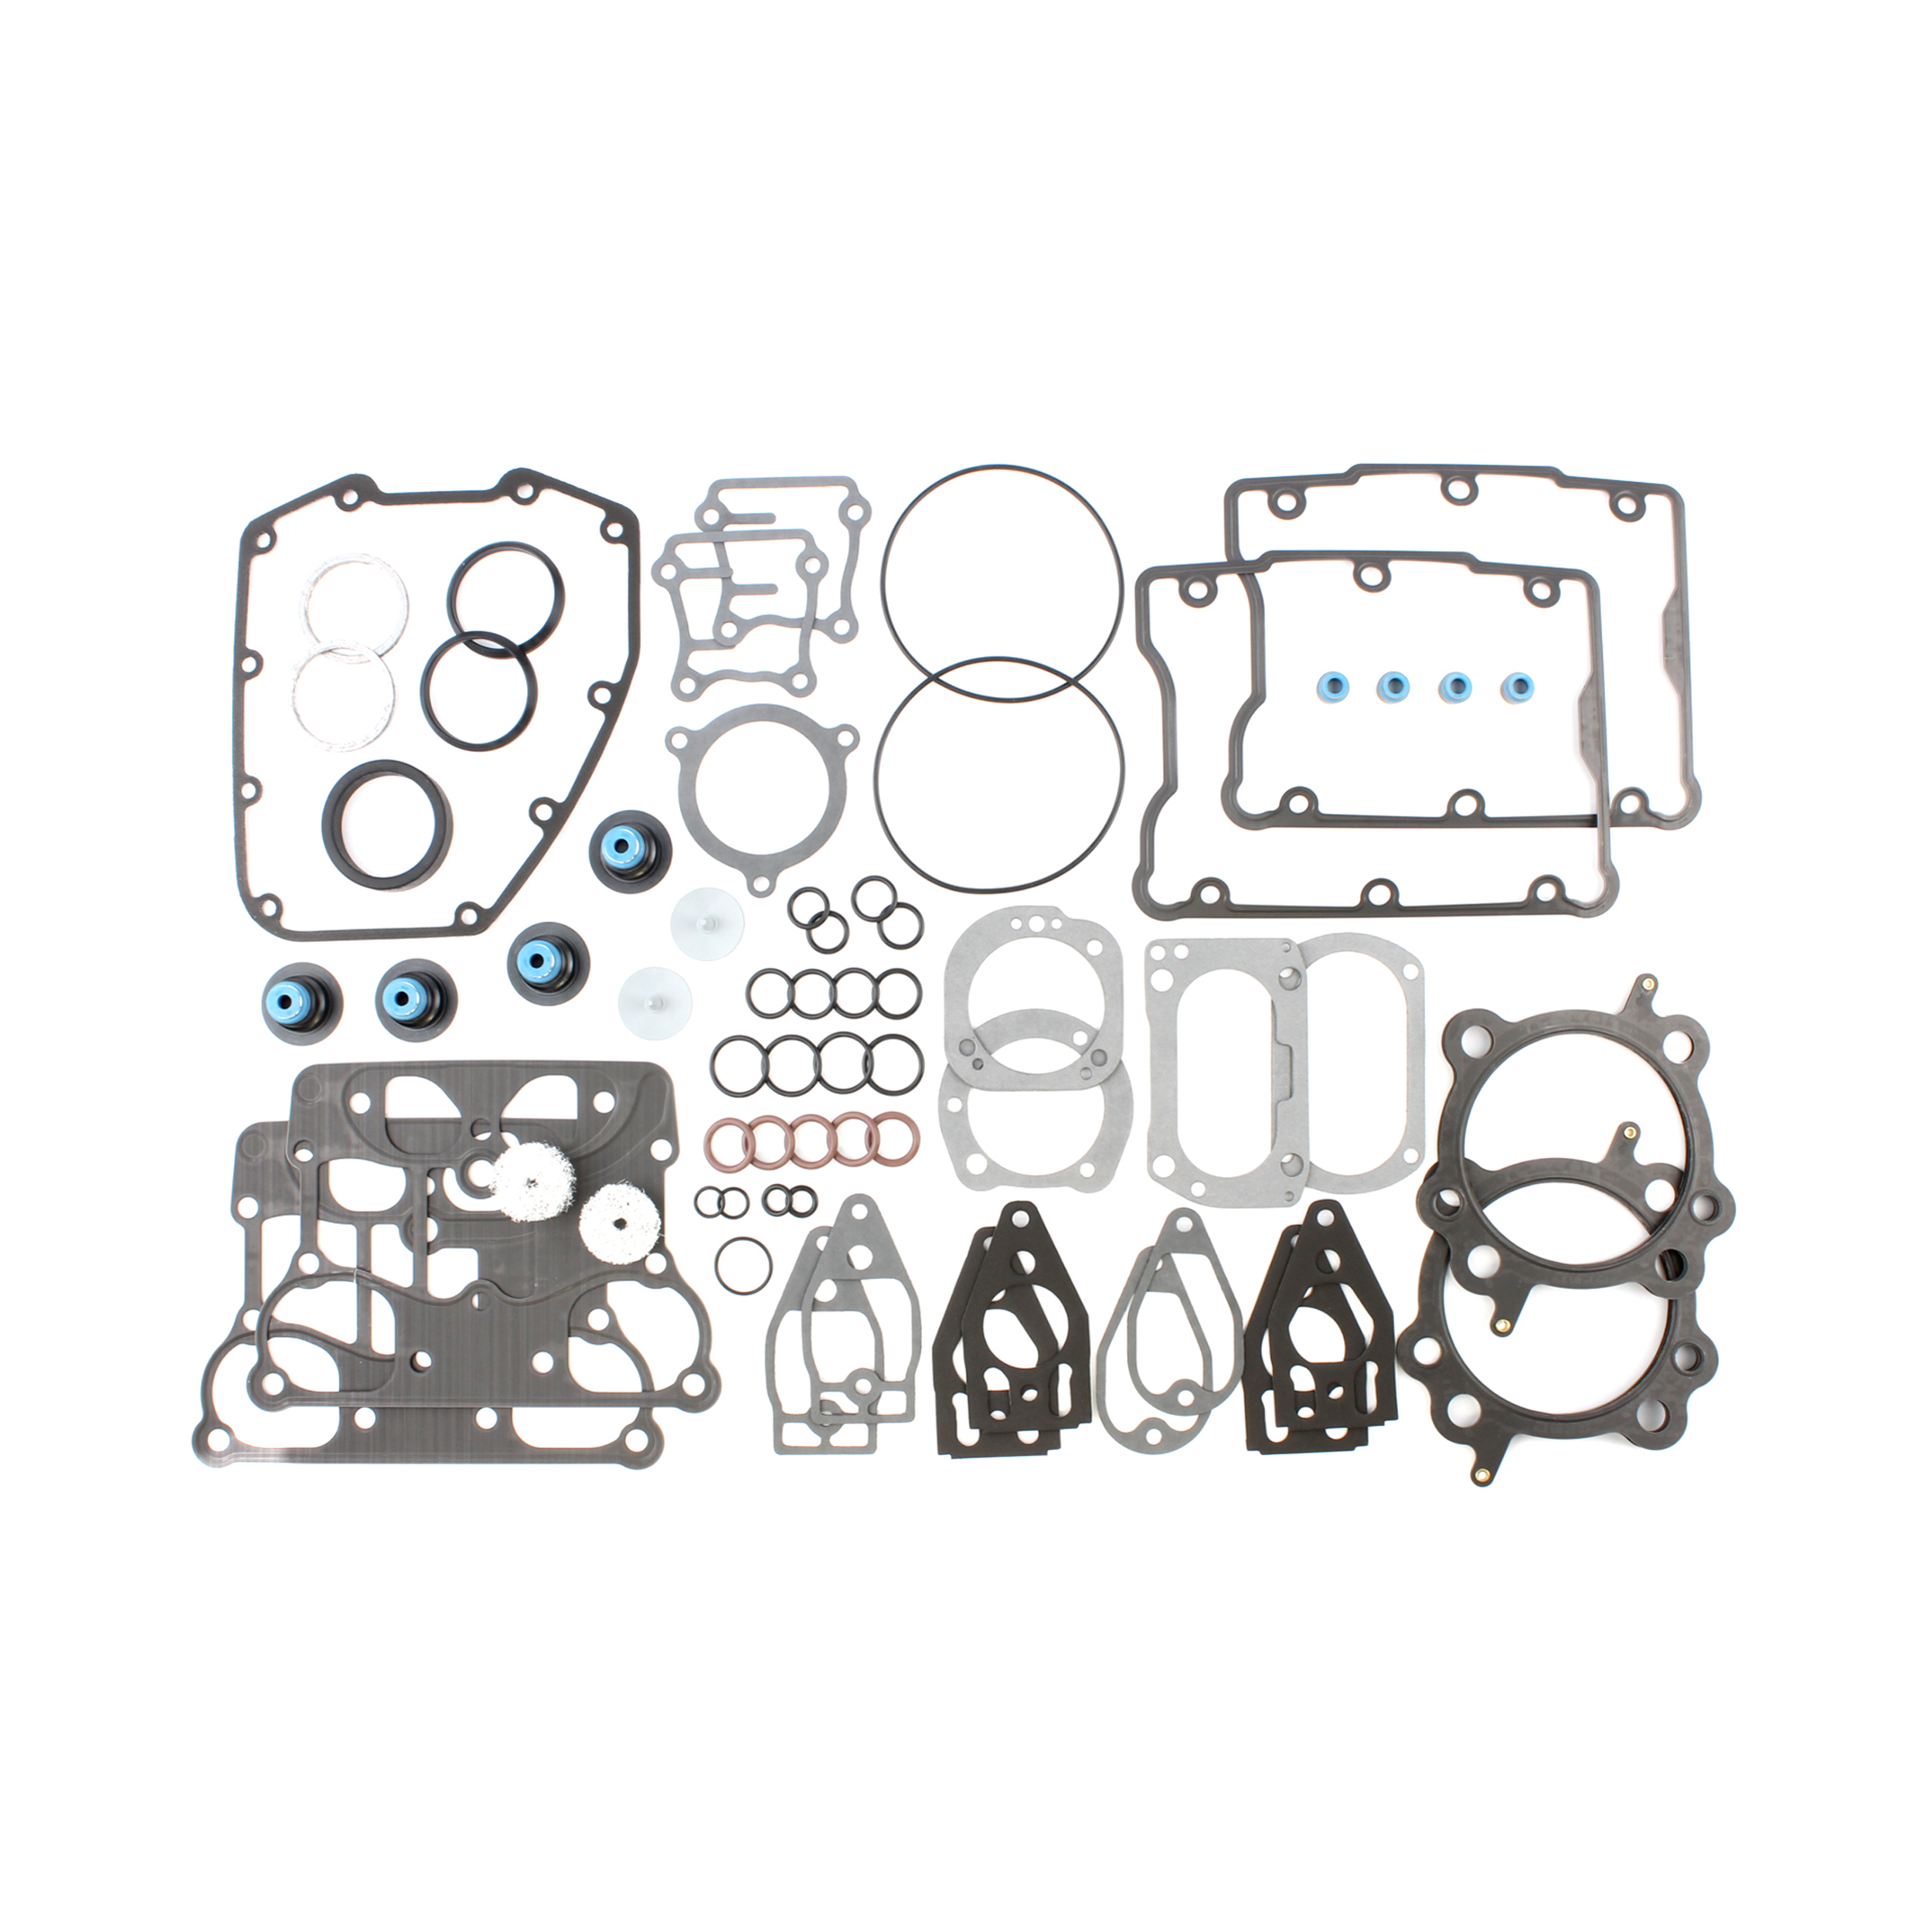 Cometic 66mm Top End Gasket Kit for Honda 2003-16 CRF230F C3132-EST